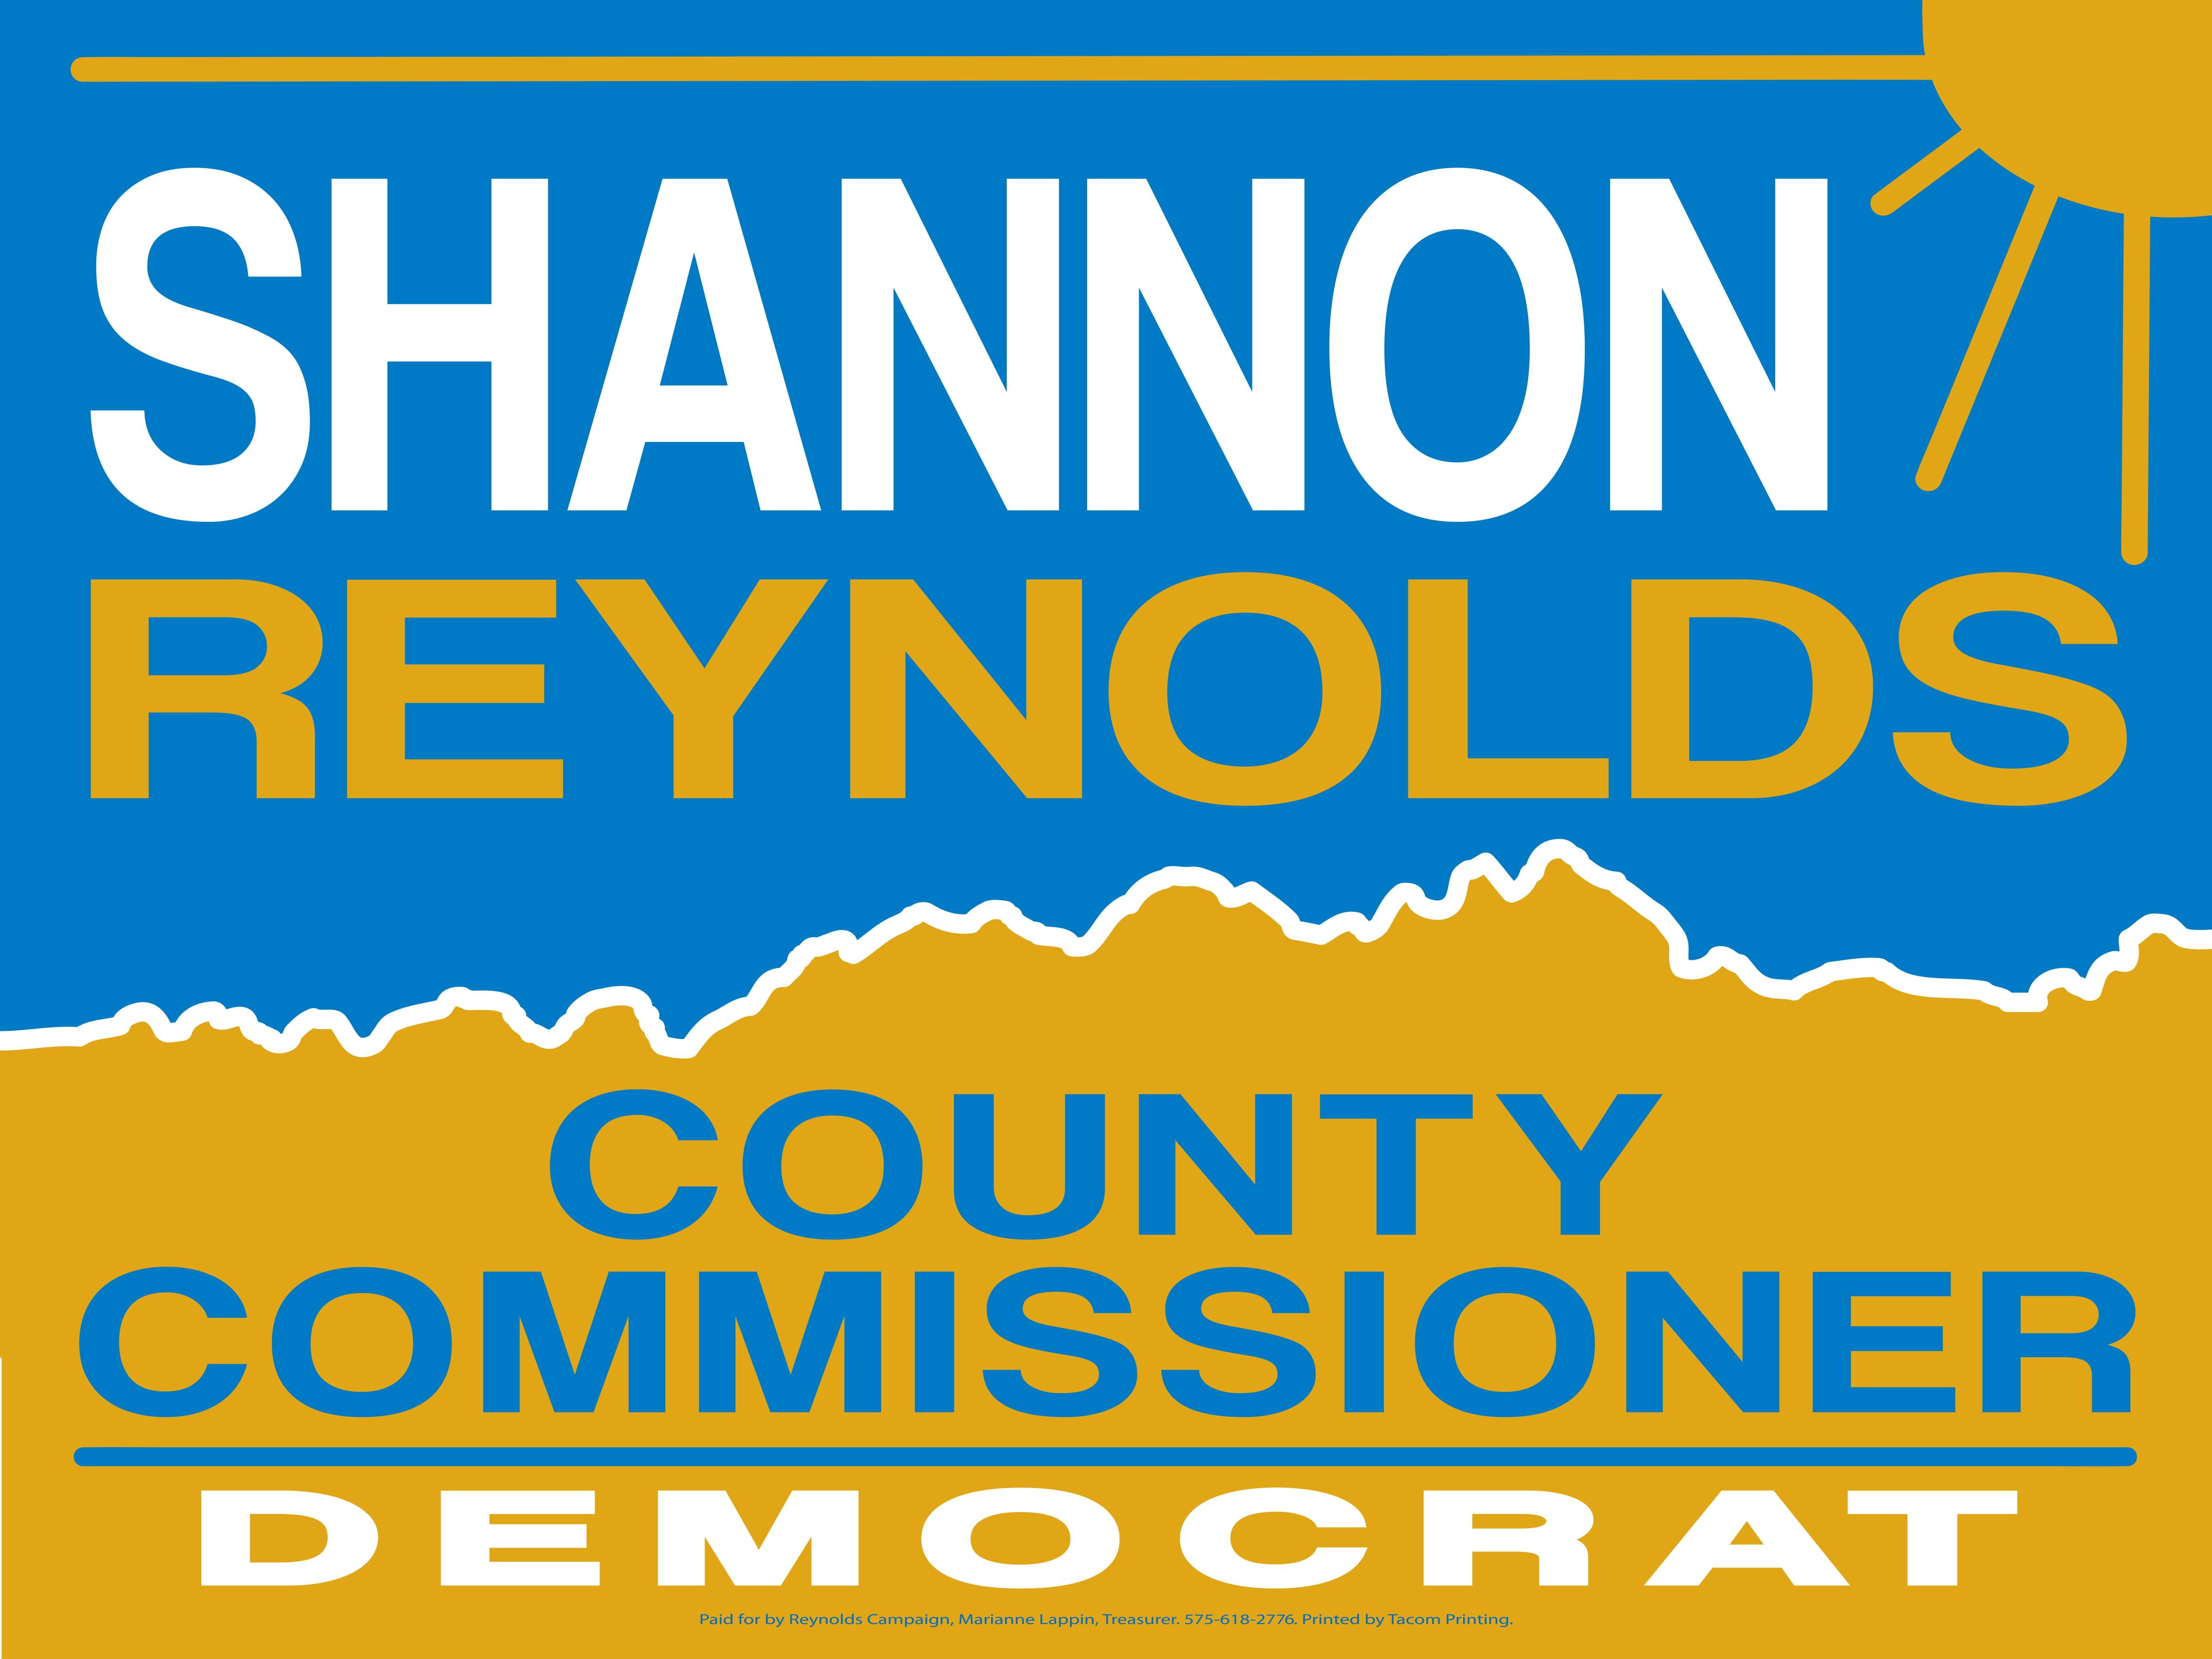 Shannon Reynolds